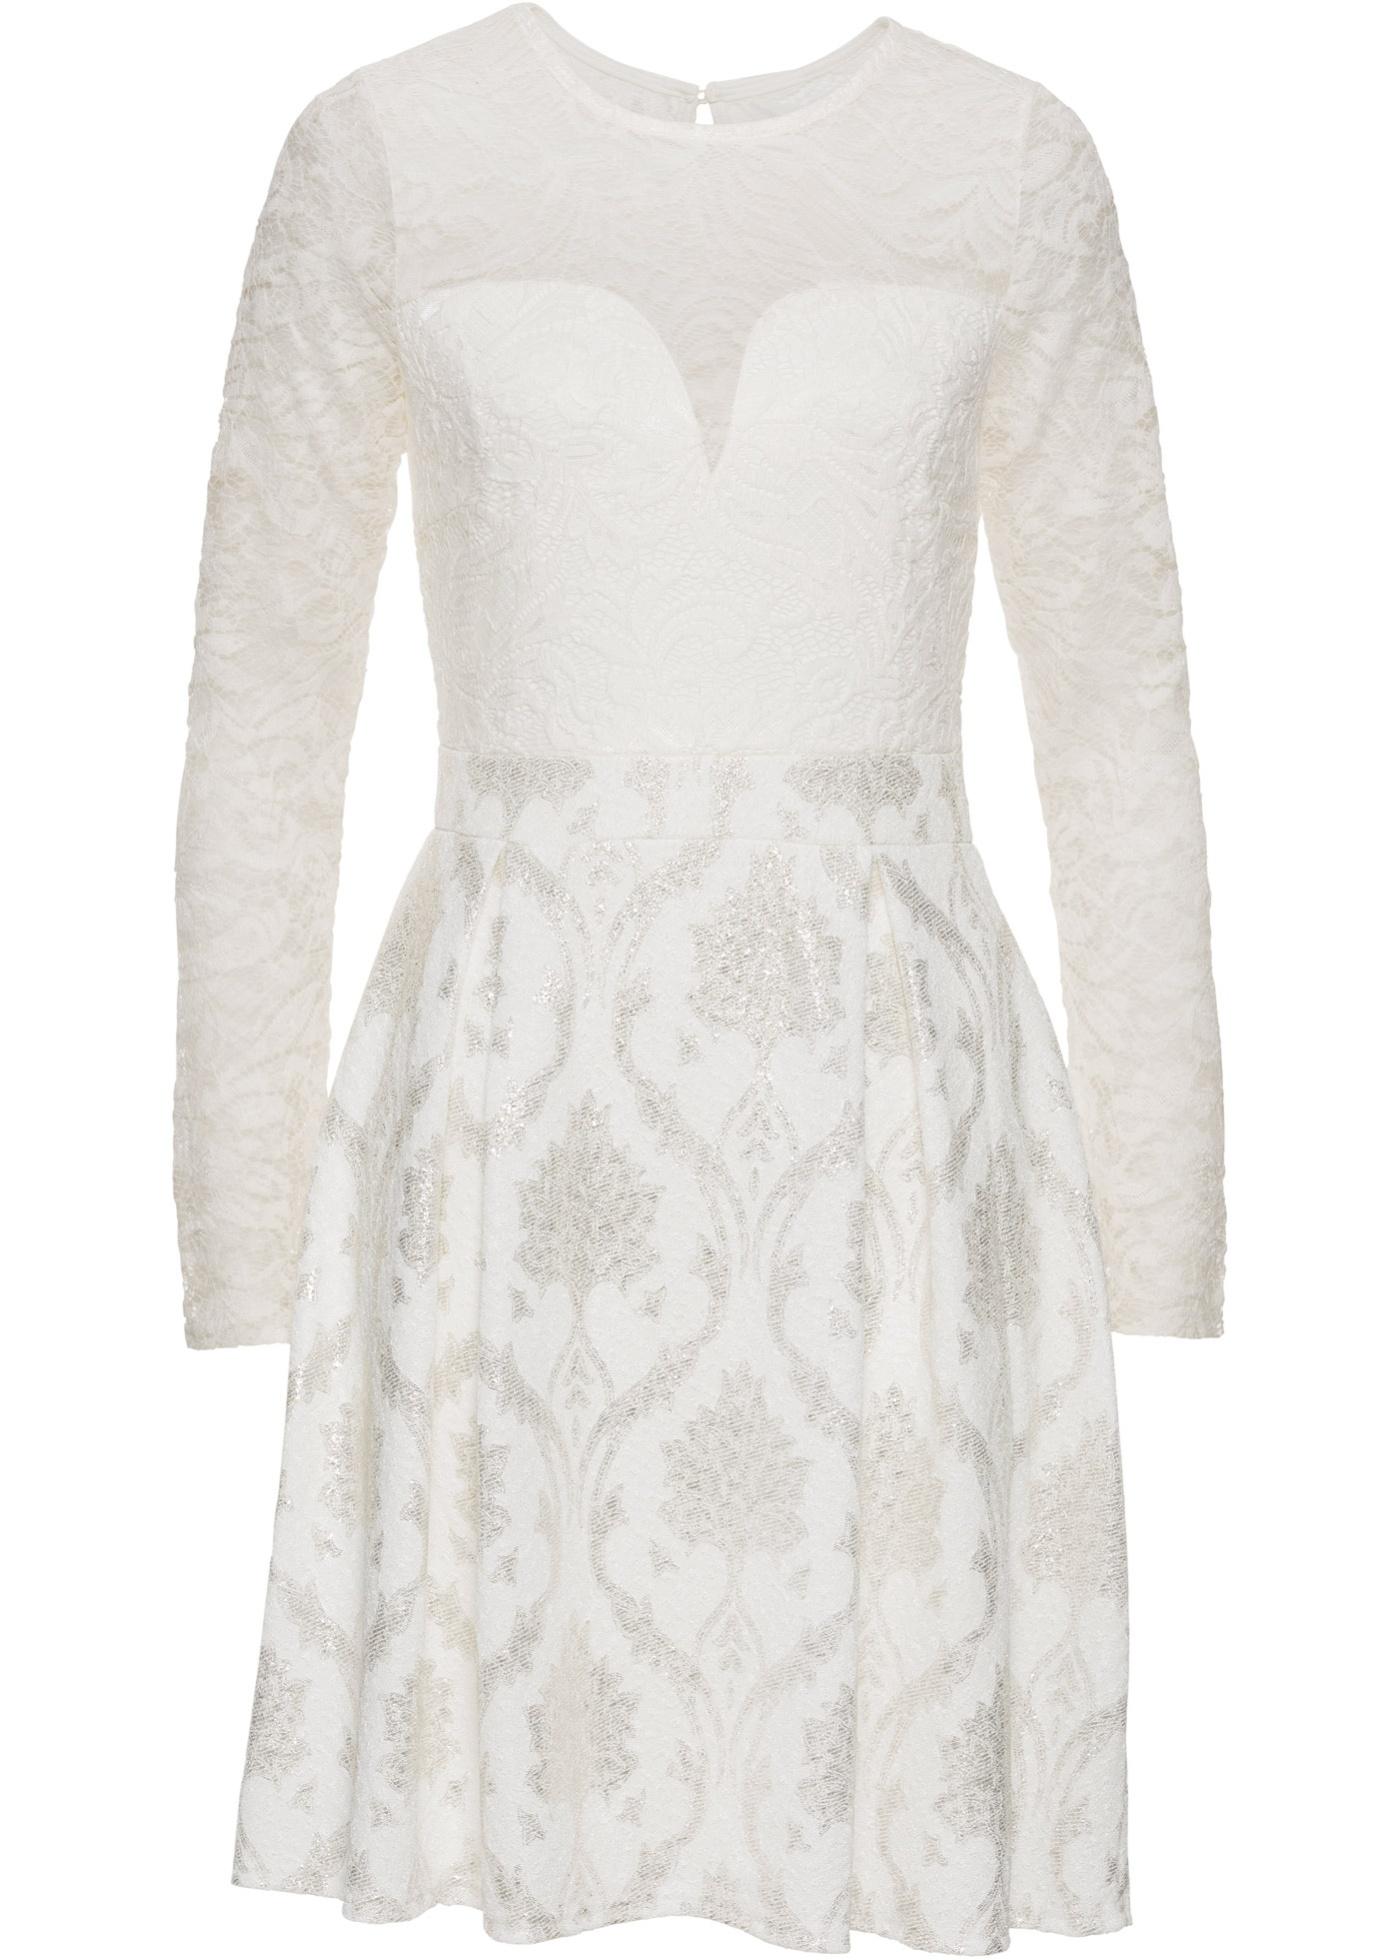 Šaty s krajkou - Bílá